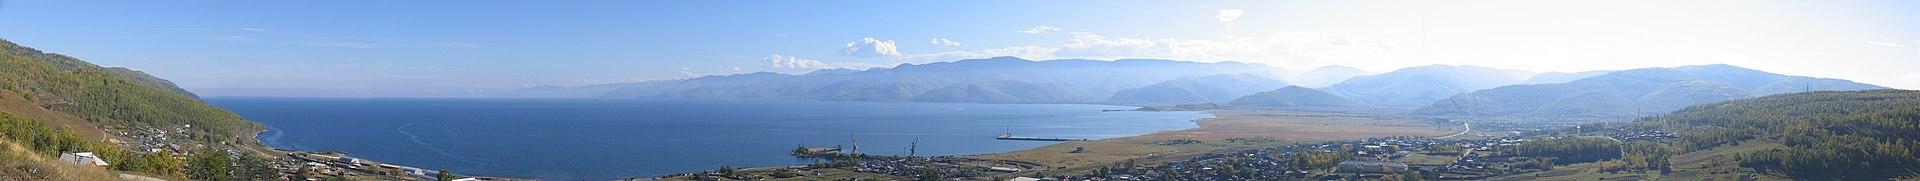 Vista panorámica del lago Baikal.